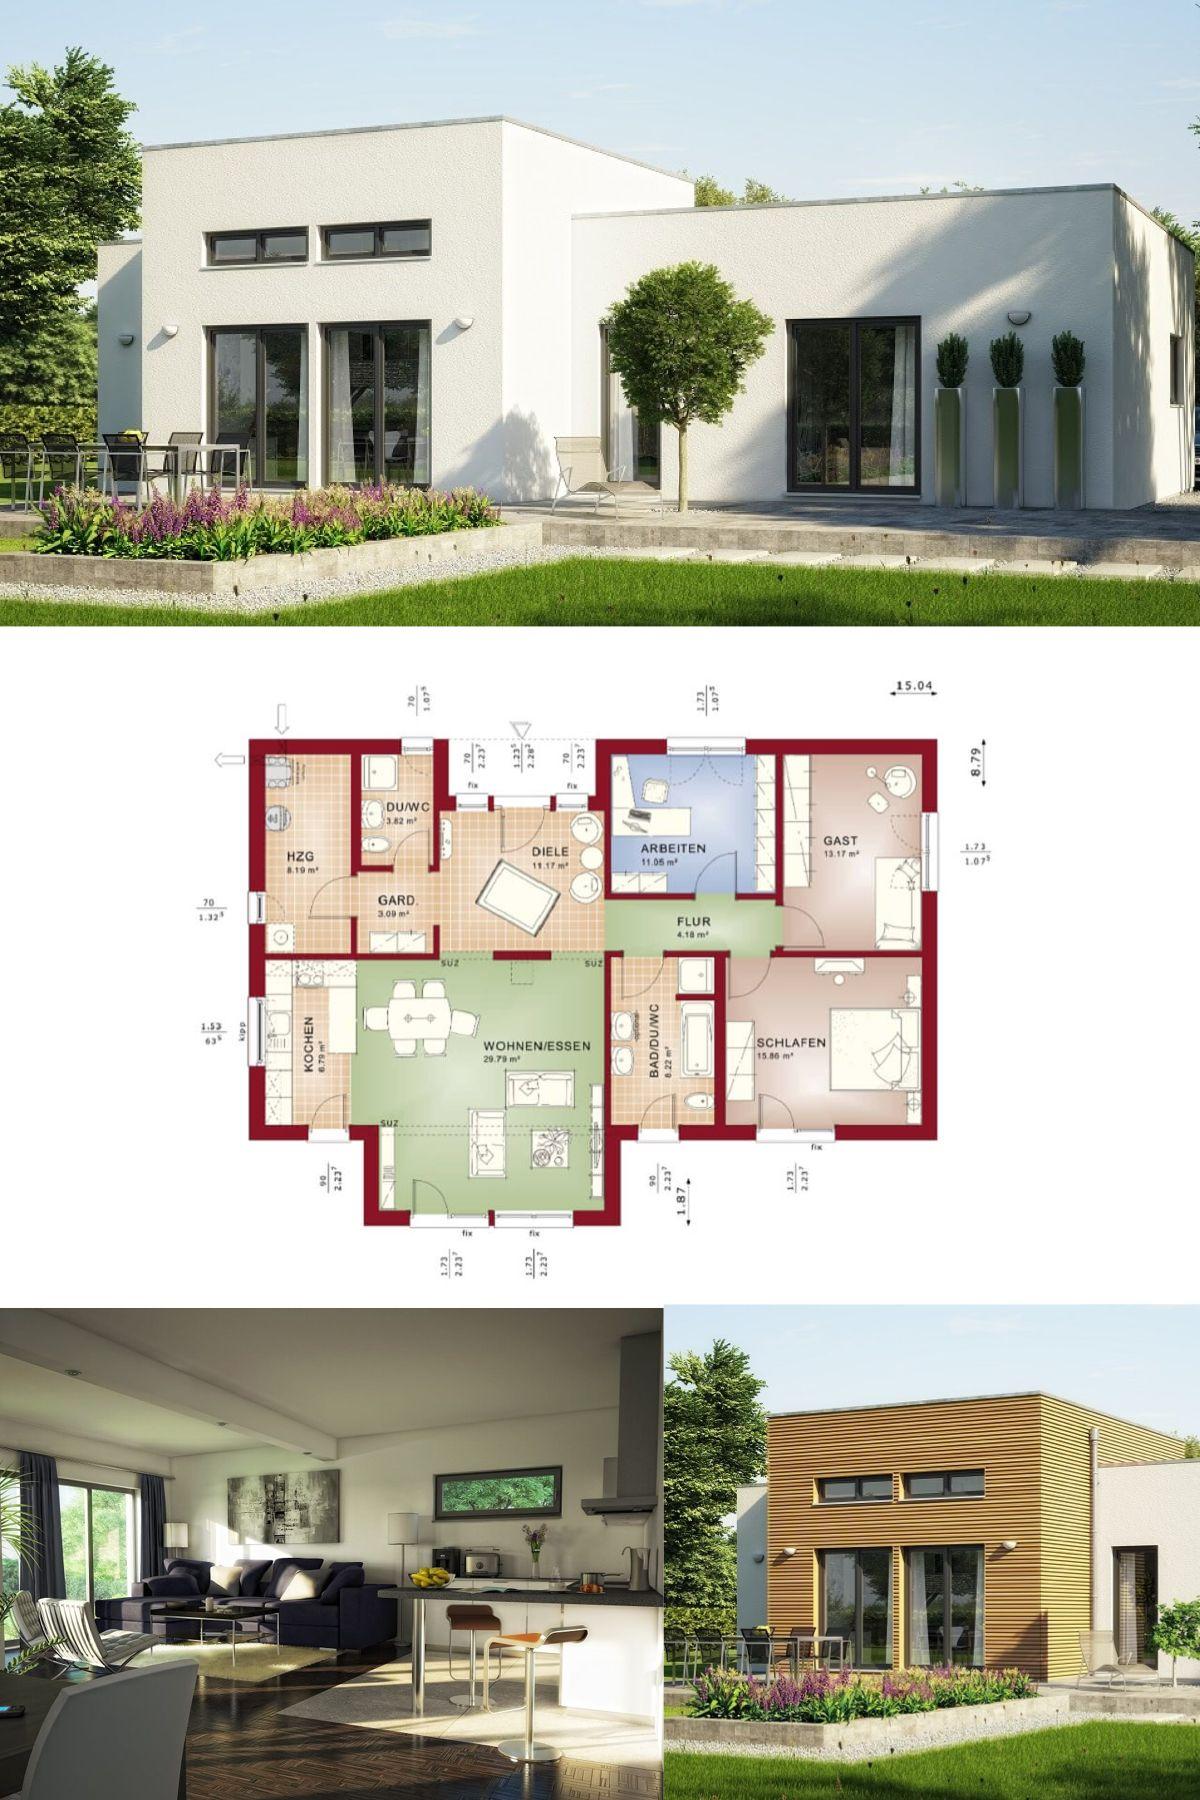 Fassade Bungalow moderner bungalow bauhausstil haus evolution 111 v4 bien zenker